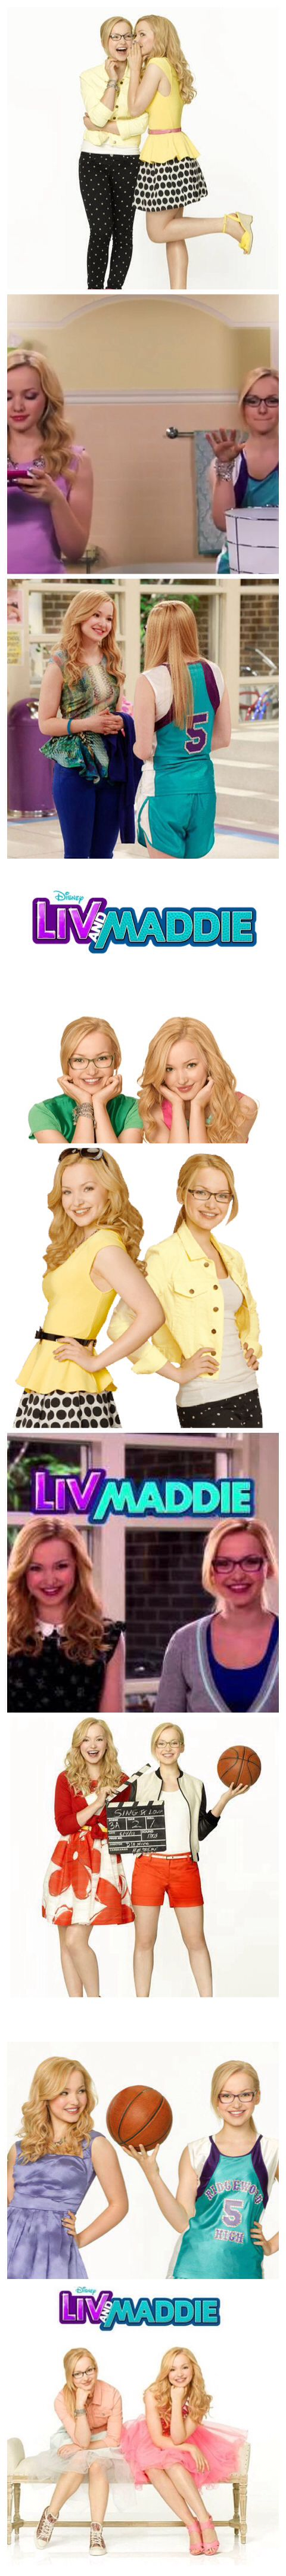 Liv and Maddie film strip